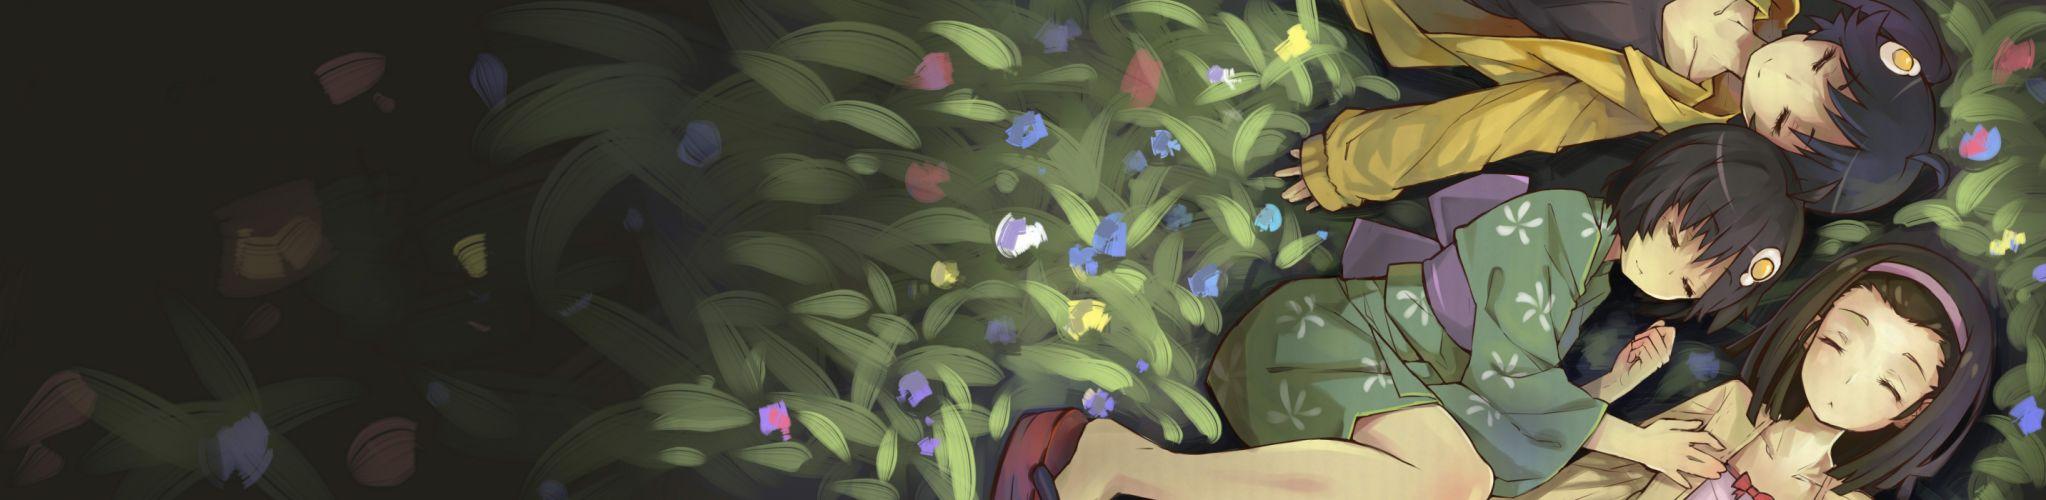 Black flowers bakemonogatari plants short hair sengoku nadeko sleeping closed eyes yukata flame japanese clothes hair band hair ornaments nisemonogatari araragi karen araragi tsukihi black hair wallpaper